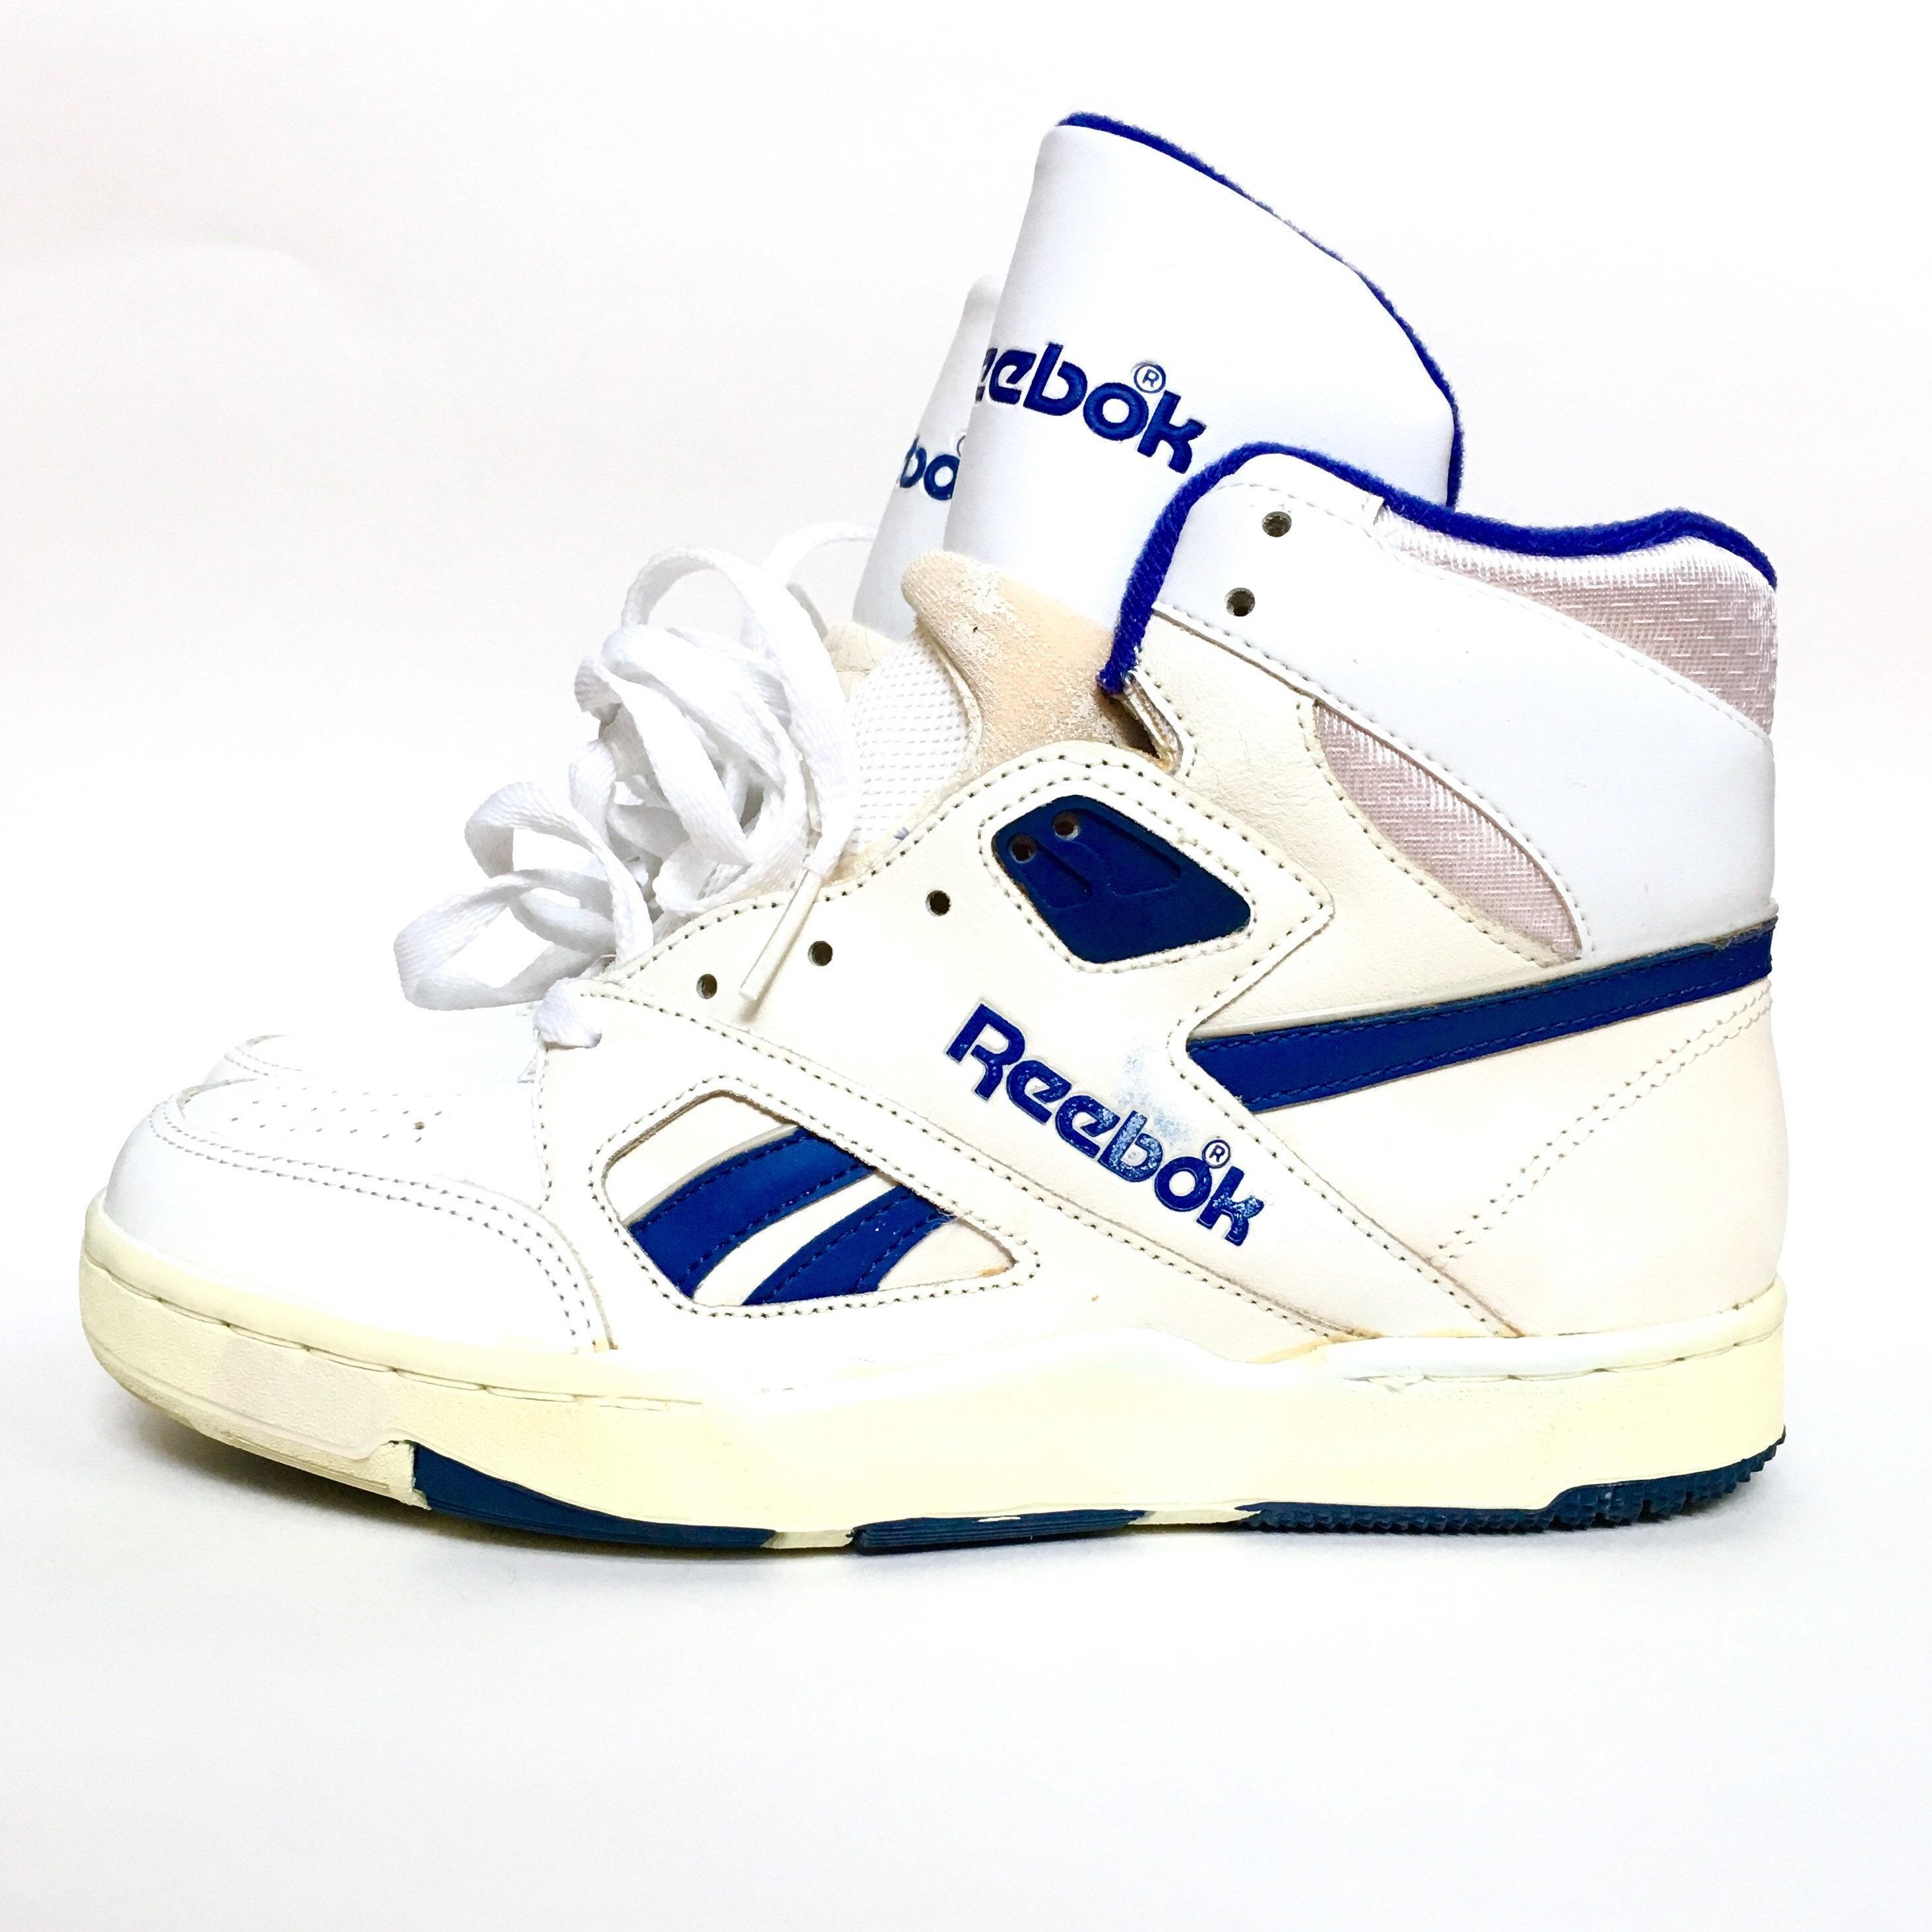 d0f9ffbf74f3b Rare Vintage 1980s 80s Reebok Hi Top Blue and White Basketball Sneakers -  Size 7 US - Model R109KJC